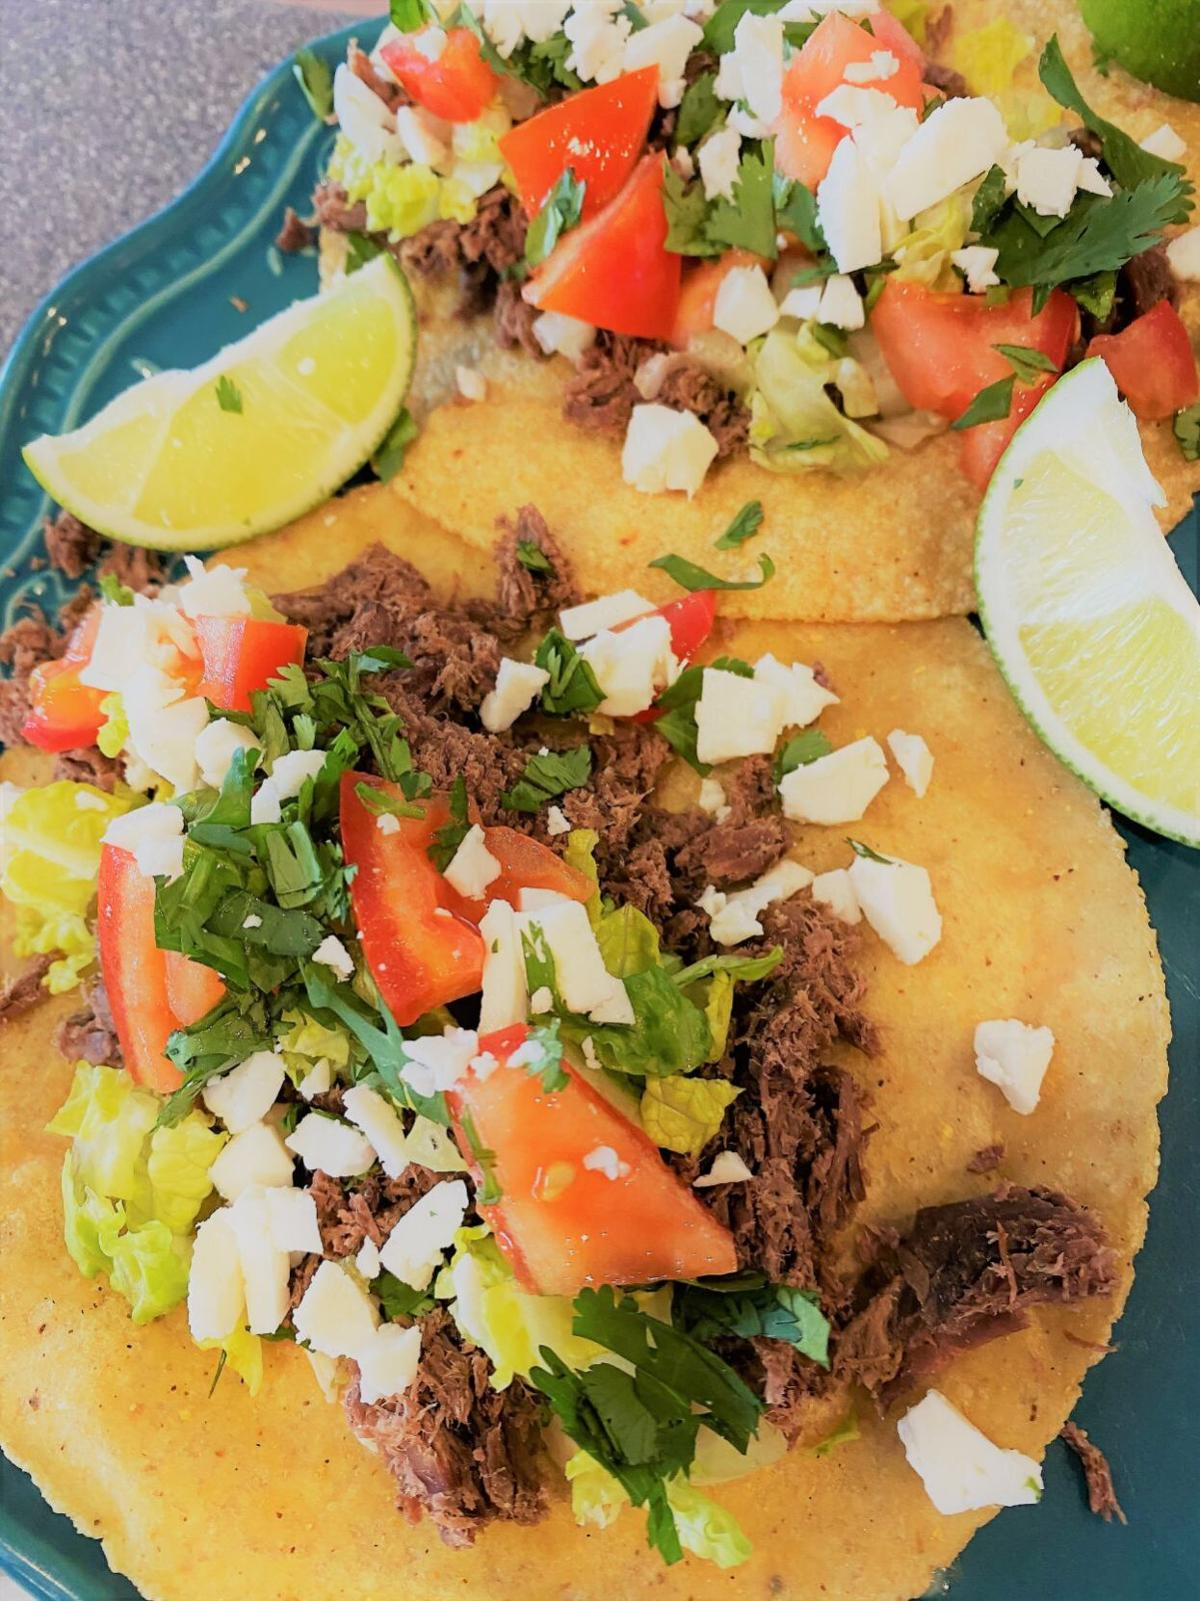 Belle's Shredded Beef Street Tacos